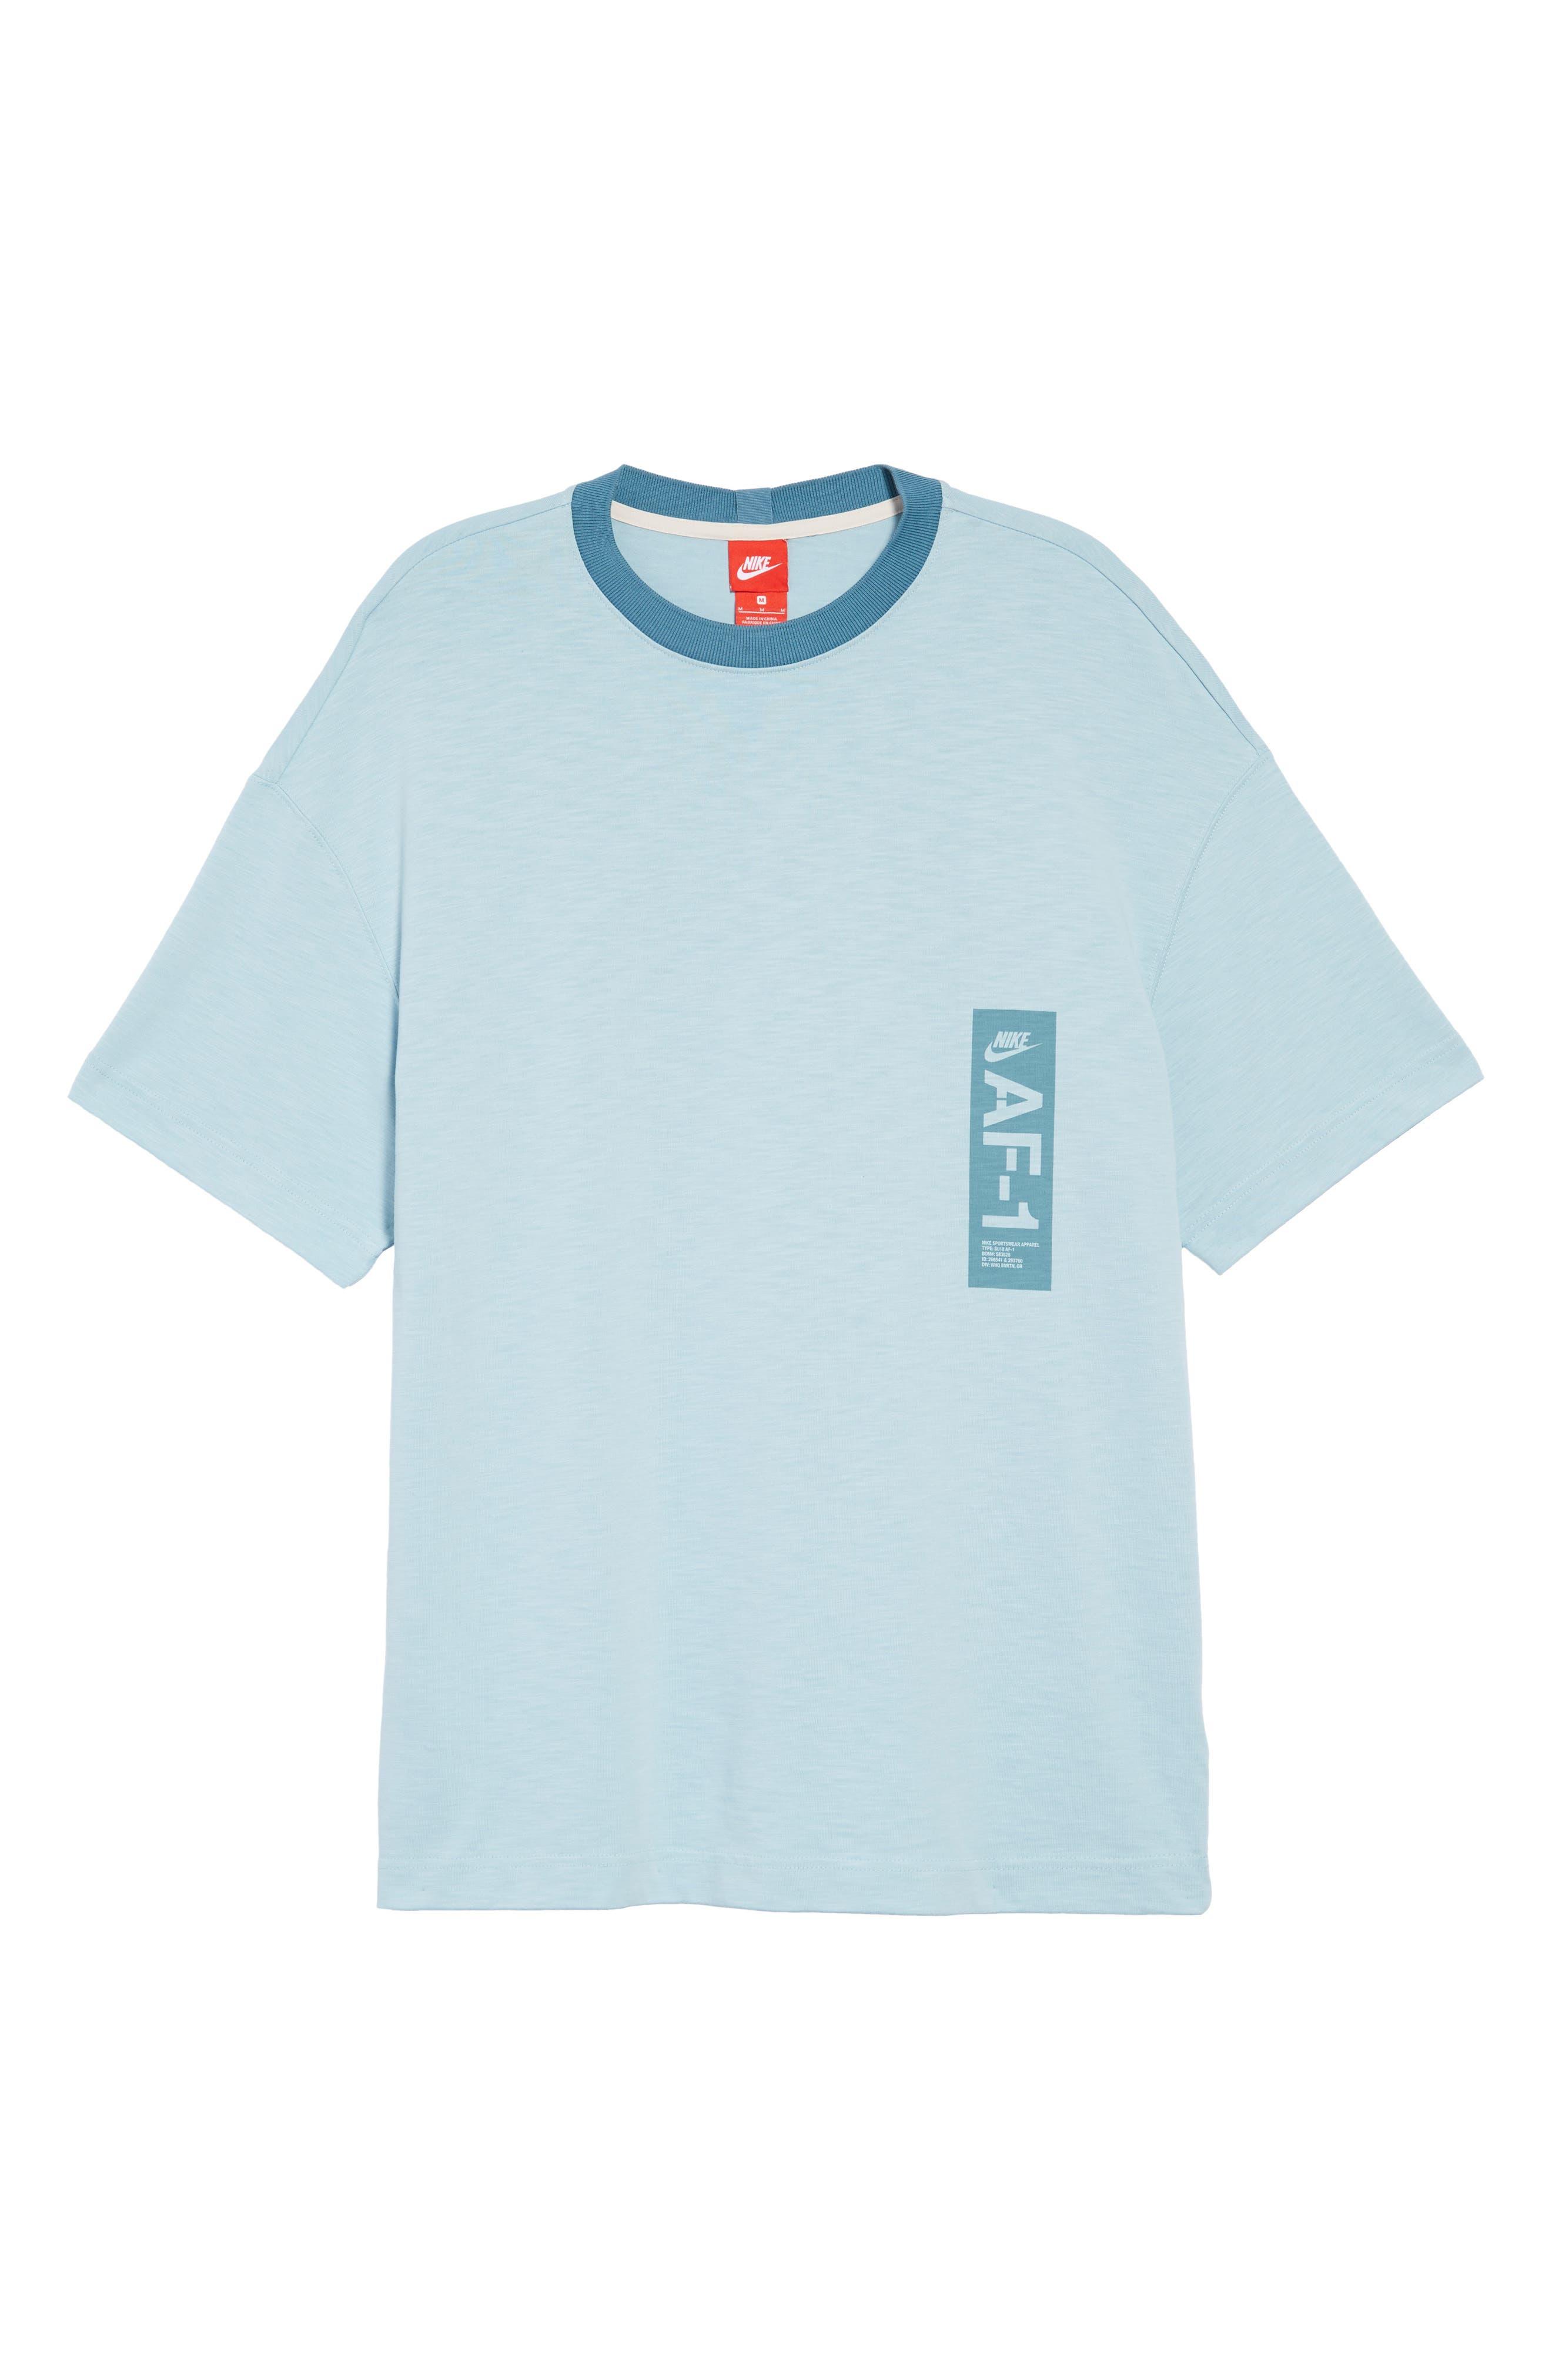 Sportswear AF1 Graphic T-Shirt,                             Alternate thumbnail 6, color,                             OCEAN BLISS/ NOISE AQUA